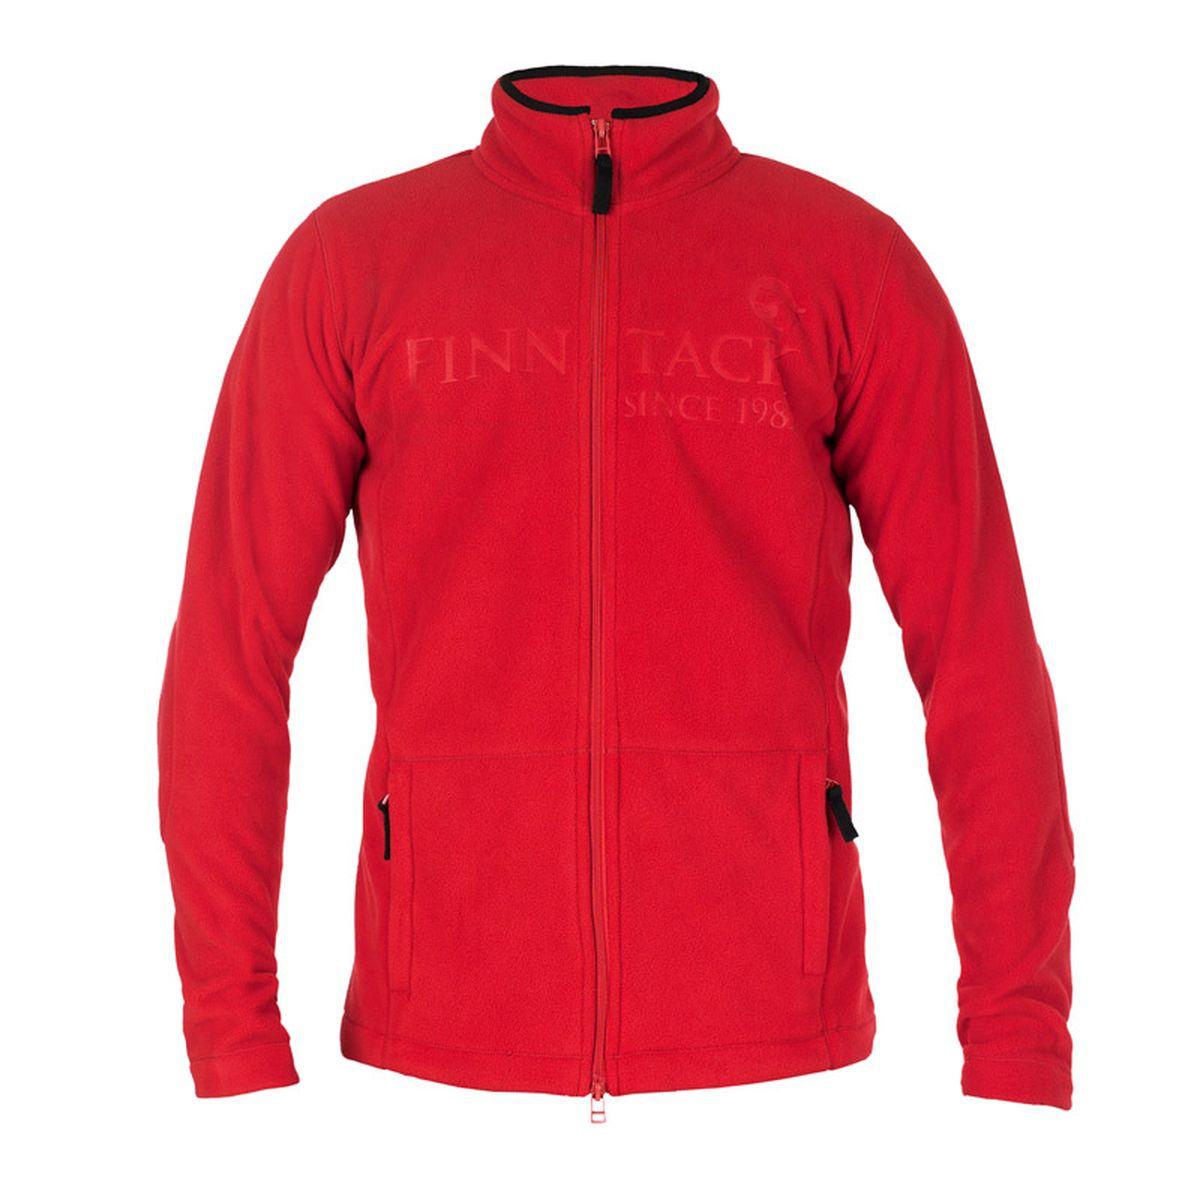 Finn Tack Fleece Jacket